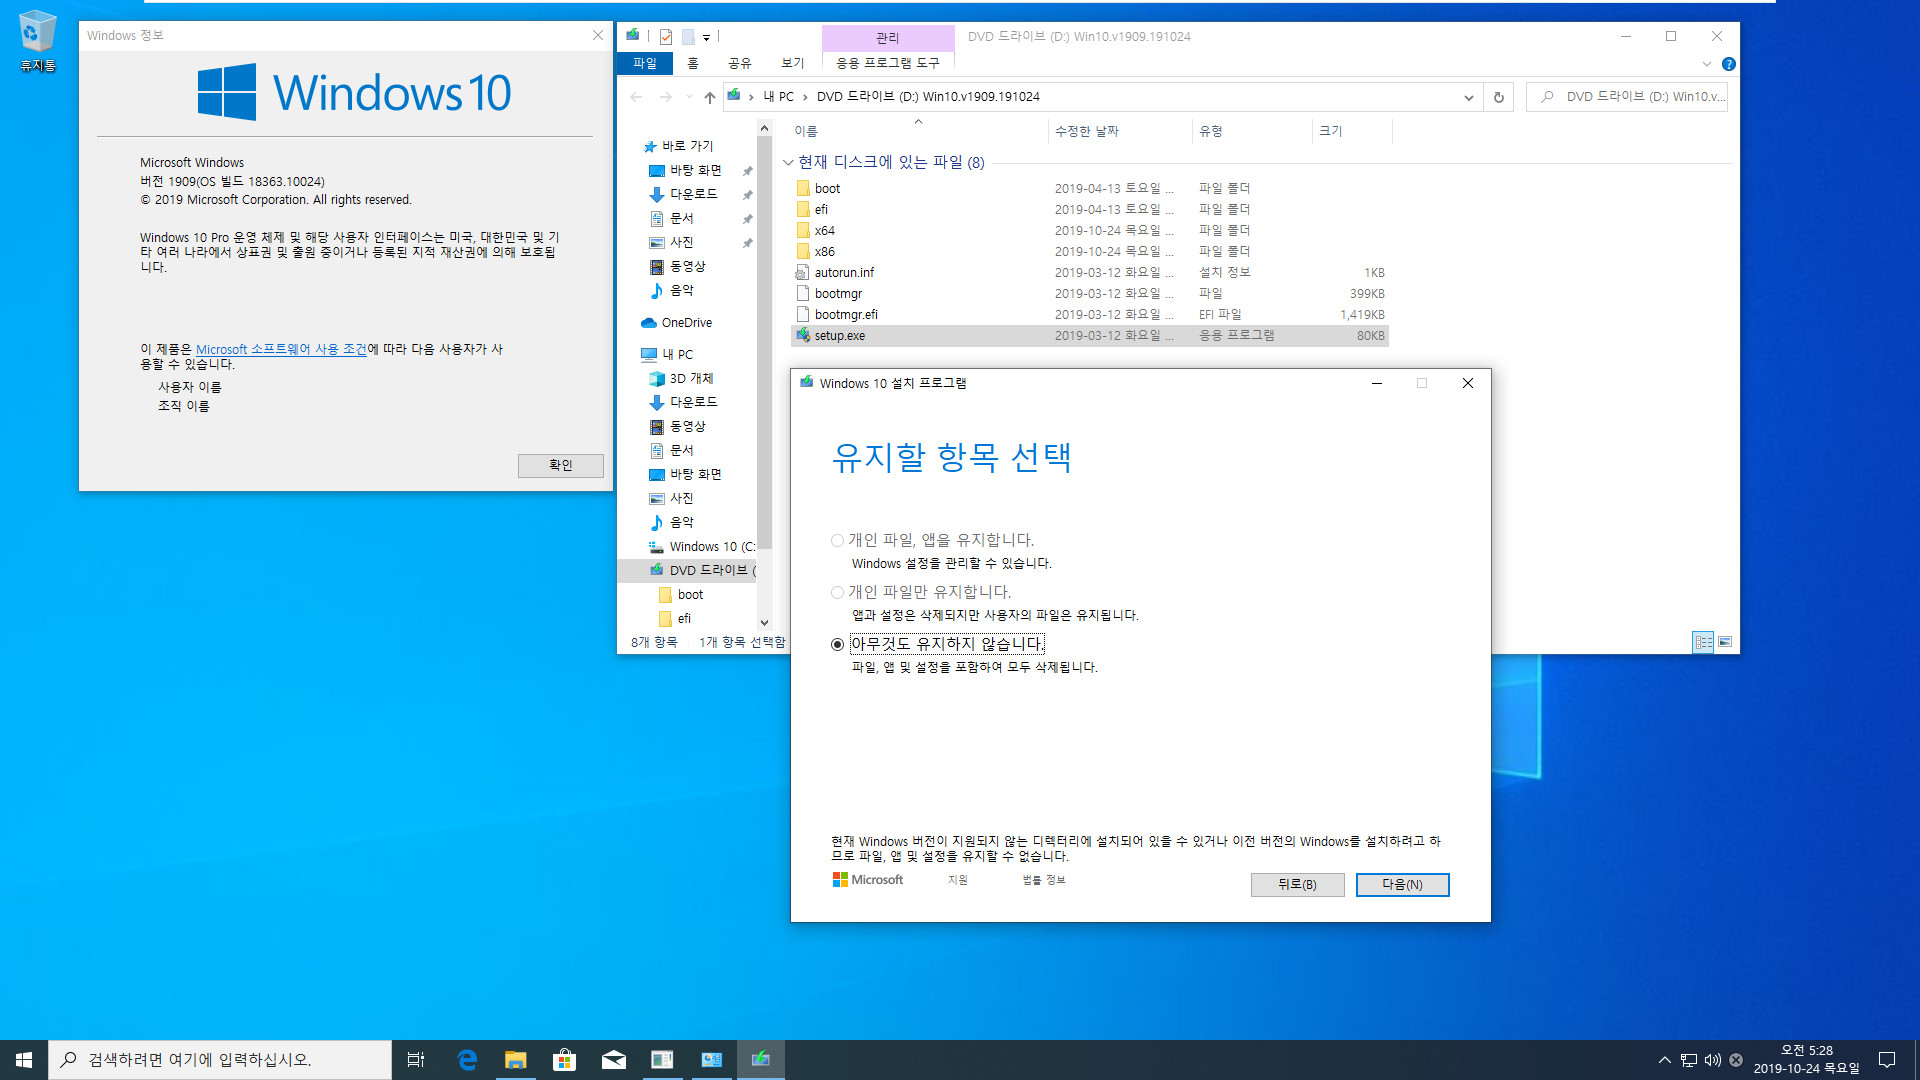 Windows 10 19H2 (버전 1909, OS 빌드 18363.10024 )를 업그레이드 설치 목적으로 통합했습니다 - 같은 빌드인데 앱 유지하면서 업그레이드 설치가 안 되네요 2019-10-24_052841.jpg